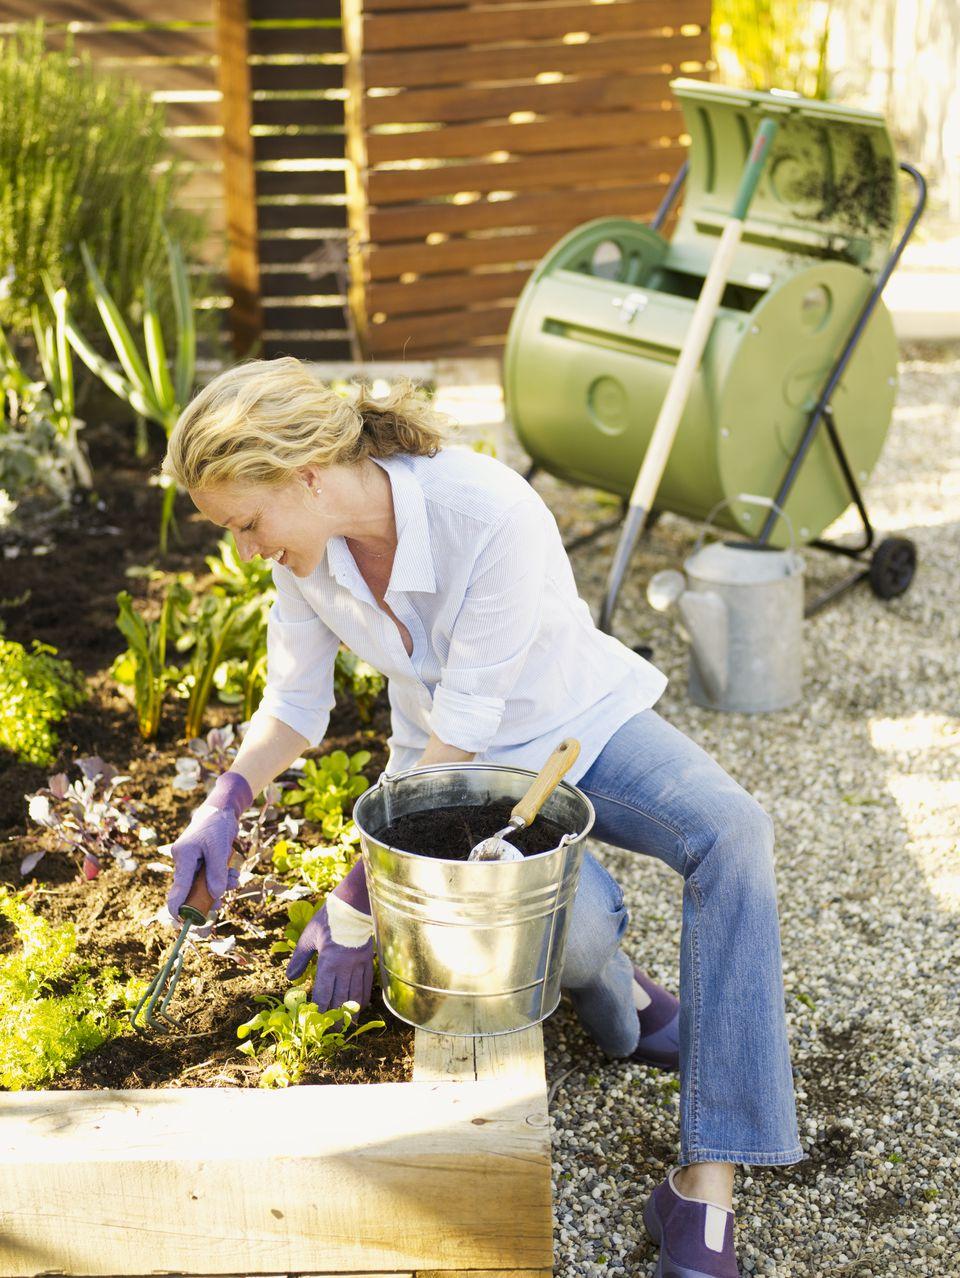 Woman gardening & composting